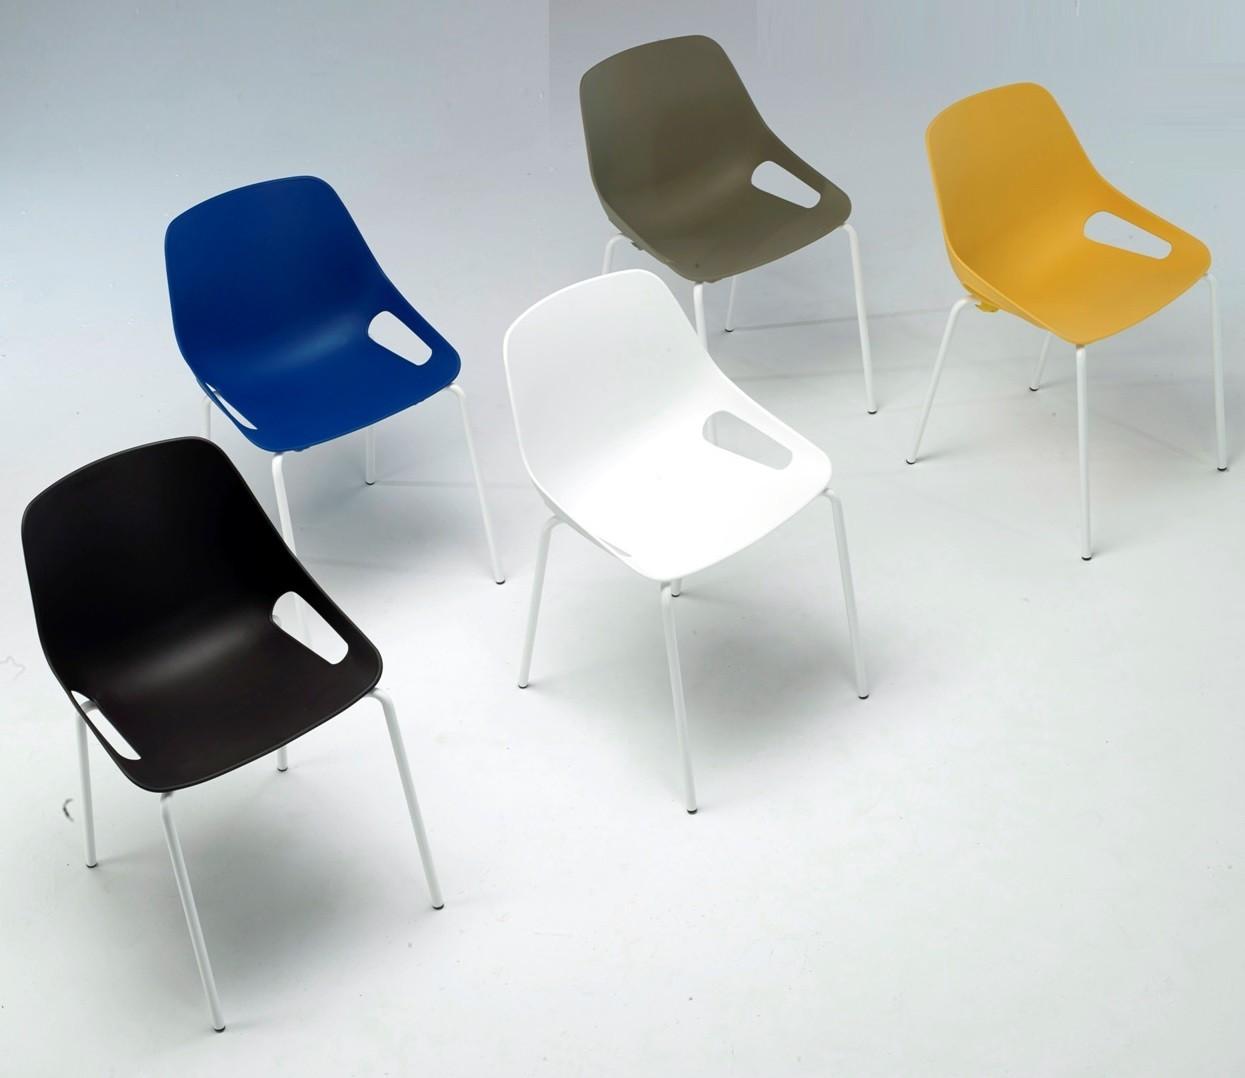 Sillas De Colores Para Oficina.Silla Polivalente De Oficina Mobiliario De Oficina Online